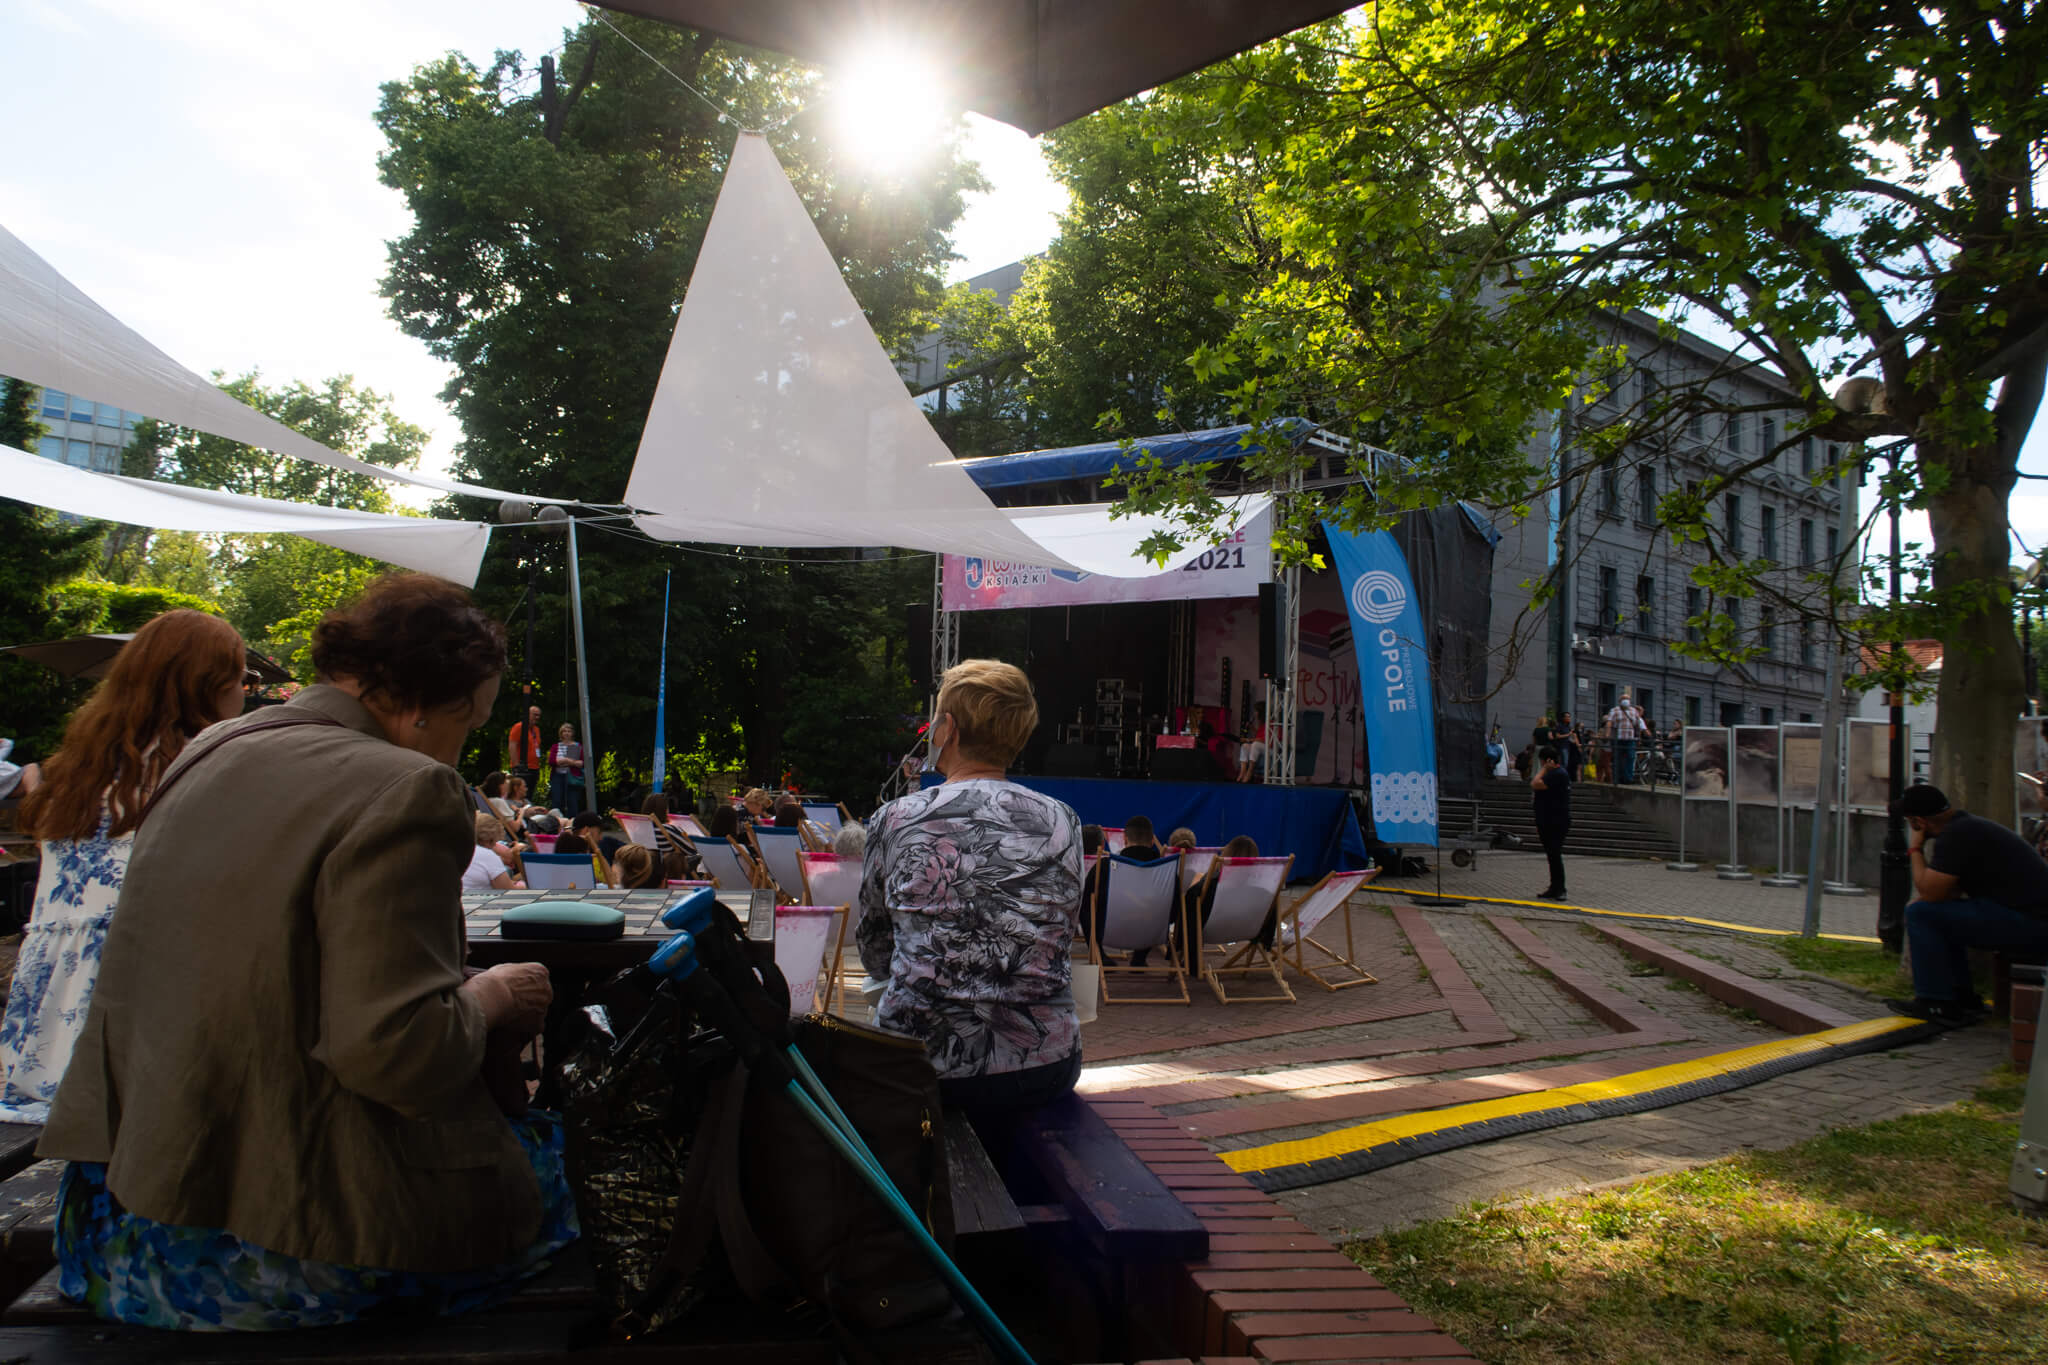 festiwal_ksiązki_opole